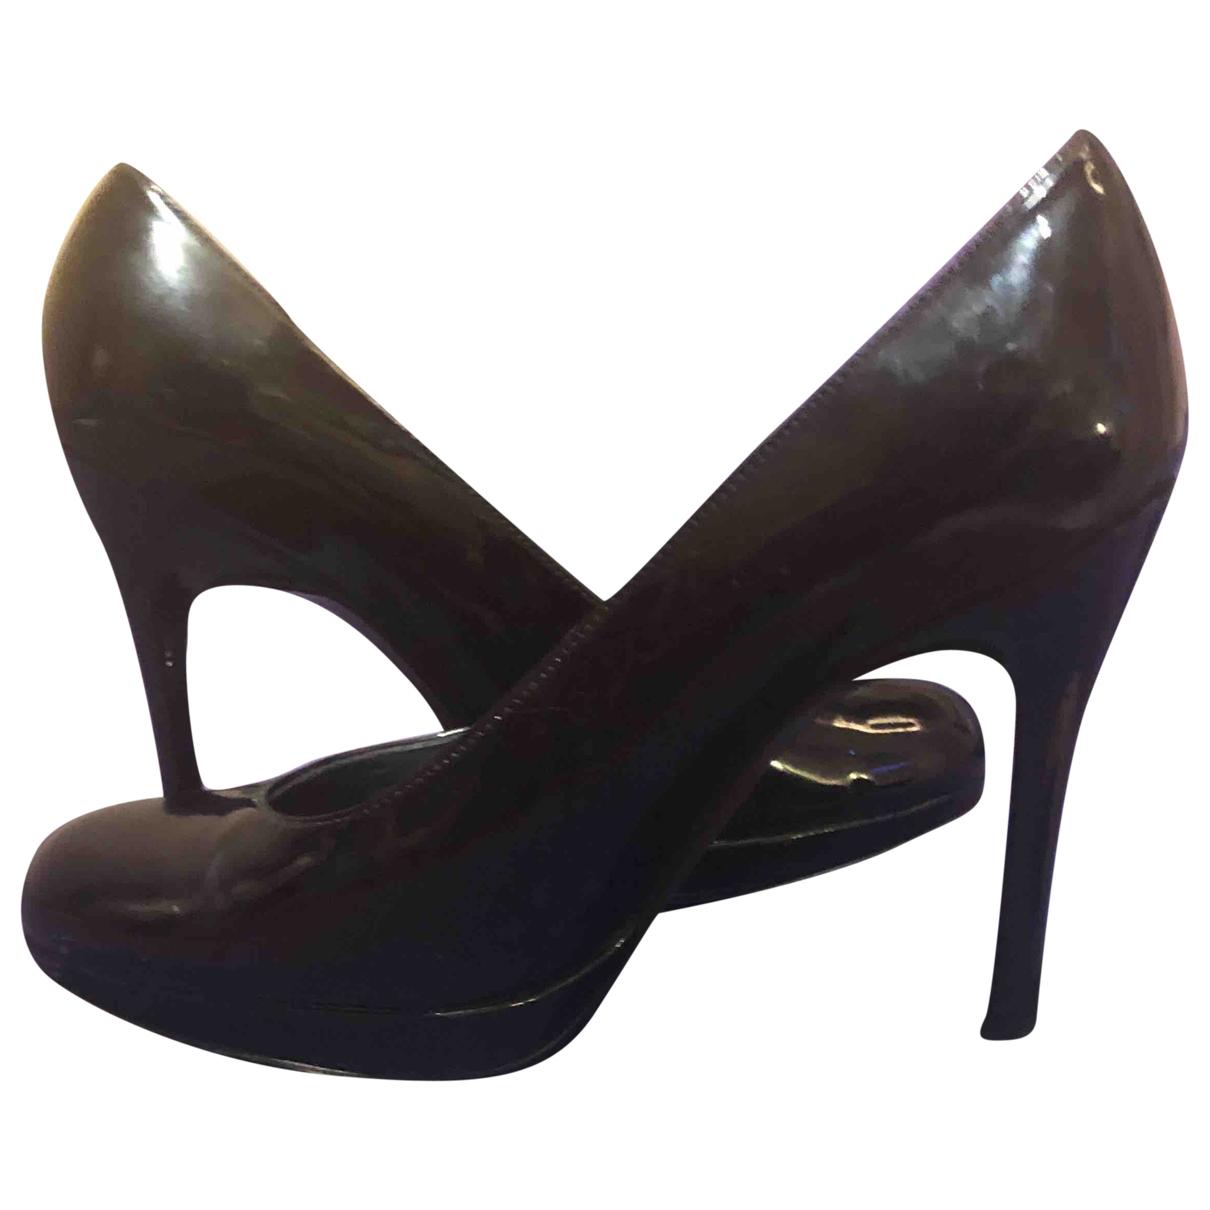 Stuart Weitzman \N Black Patent leather Heels for Women 36 EU